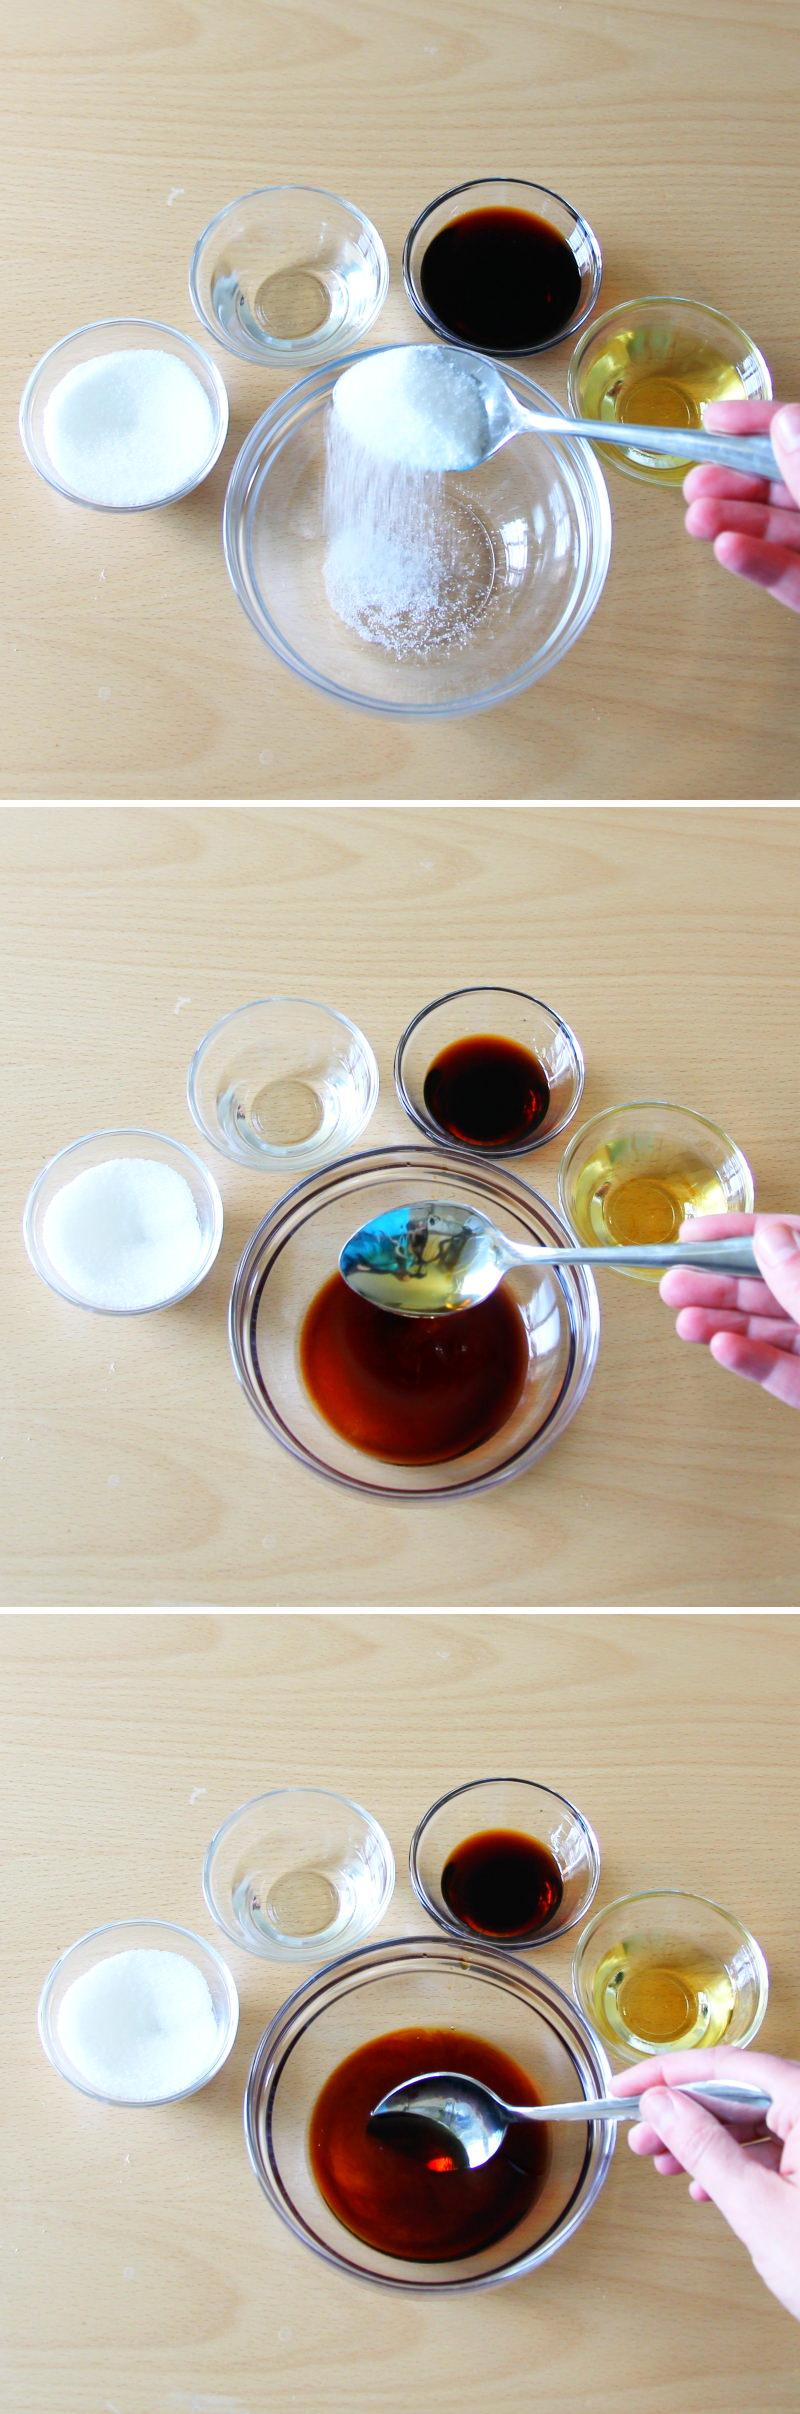 Teriyaki Lachs Schritt 2 Sauce zubereiten